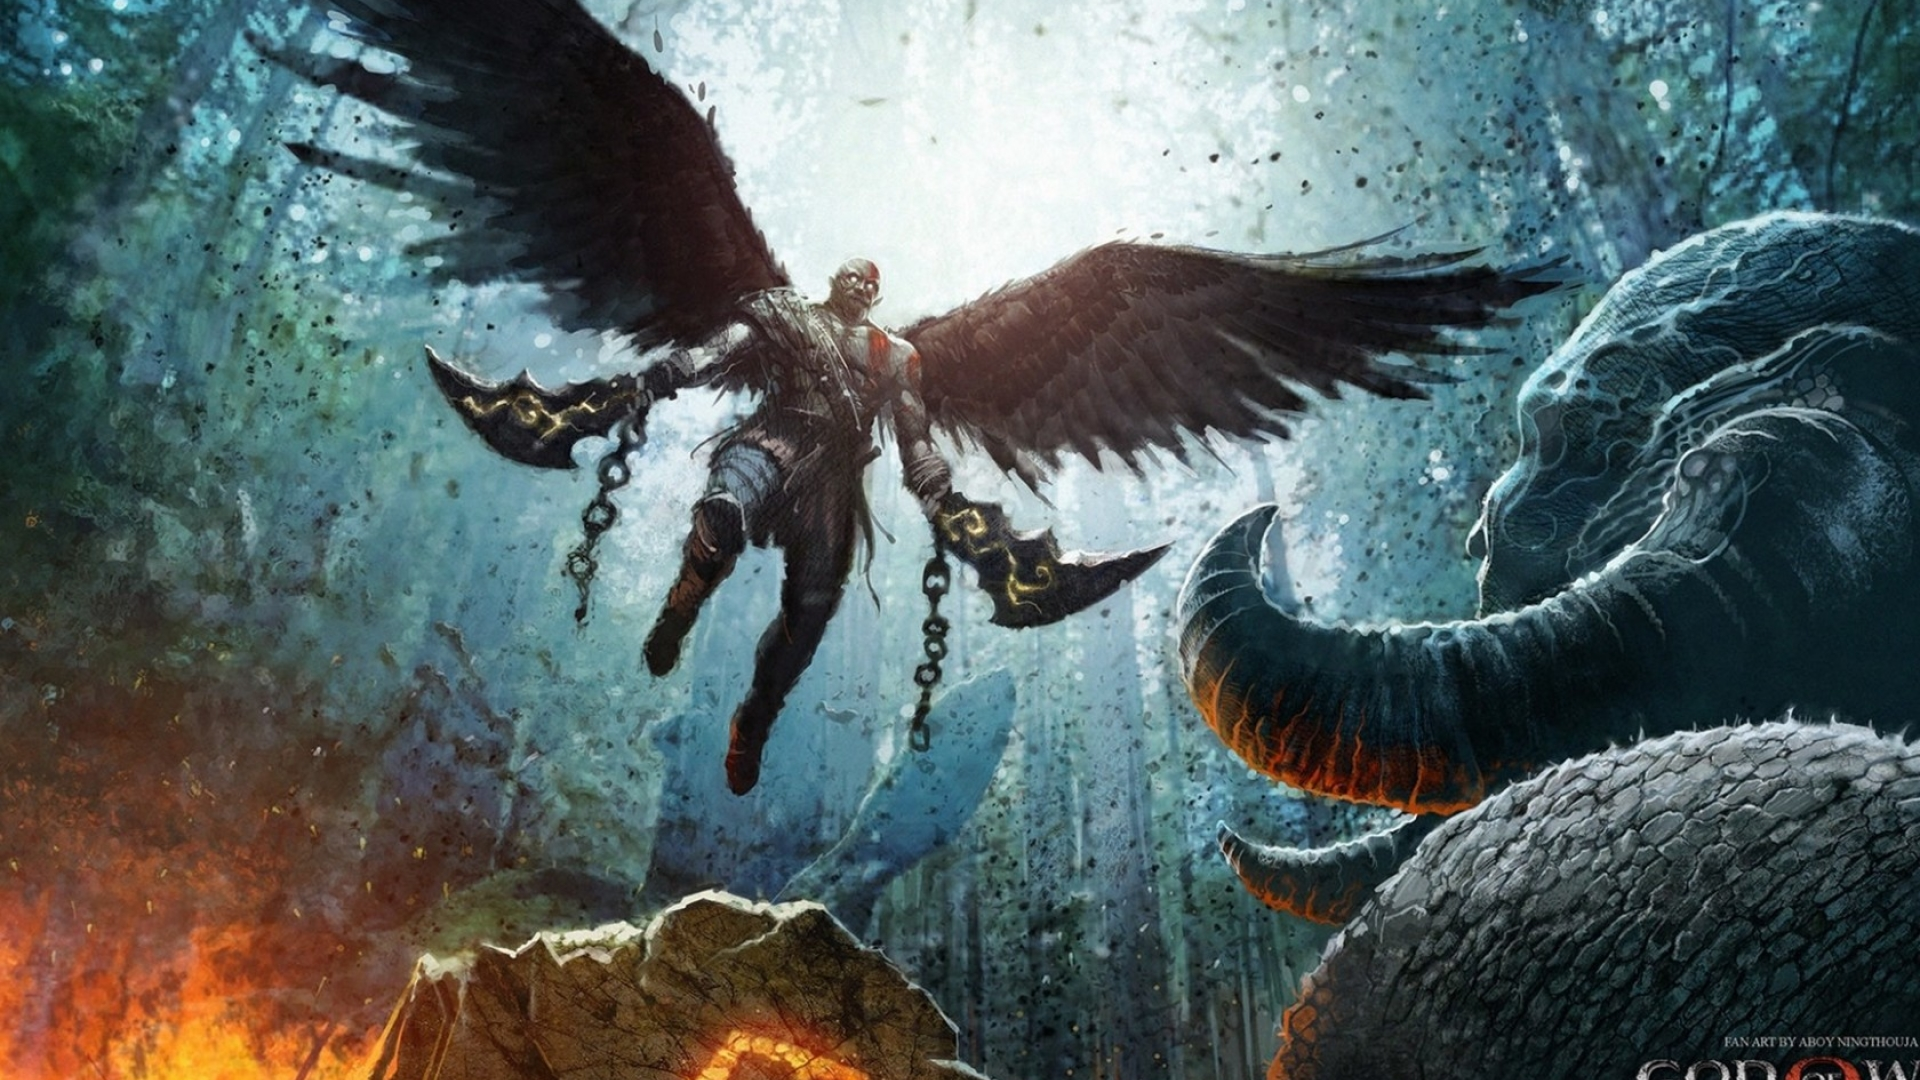 1920x1080 God Of War 4 Wings Warrior 1080p Laptop Full Hd